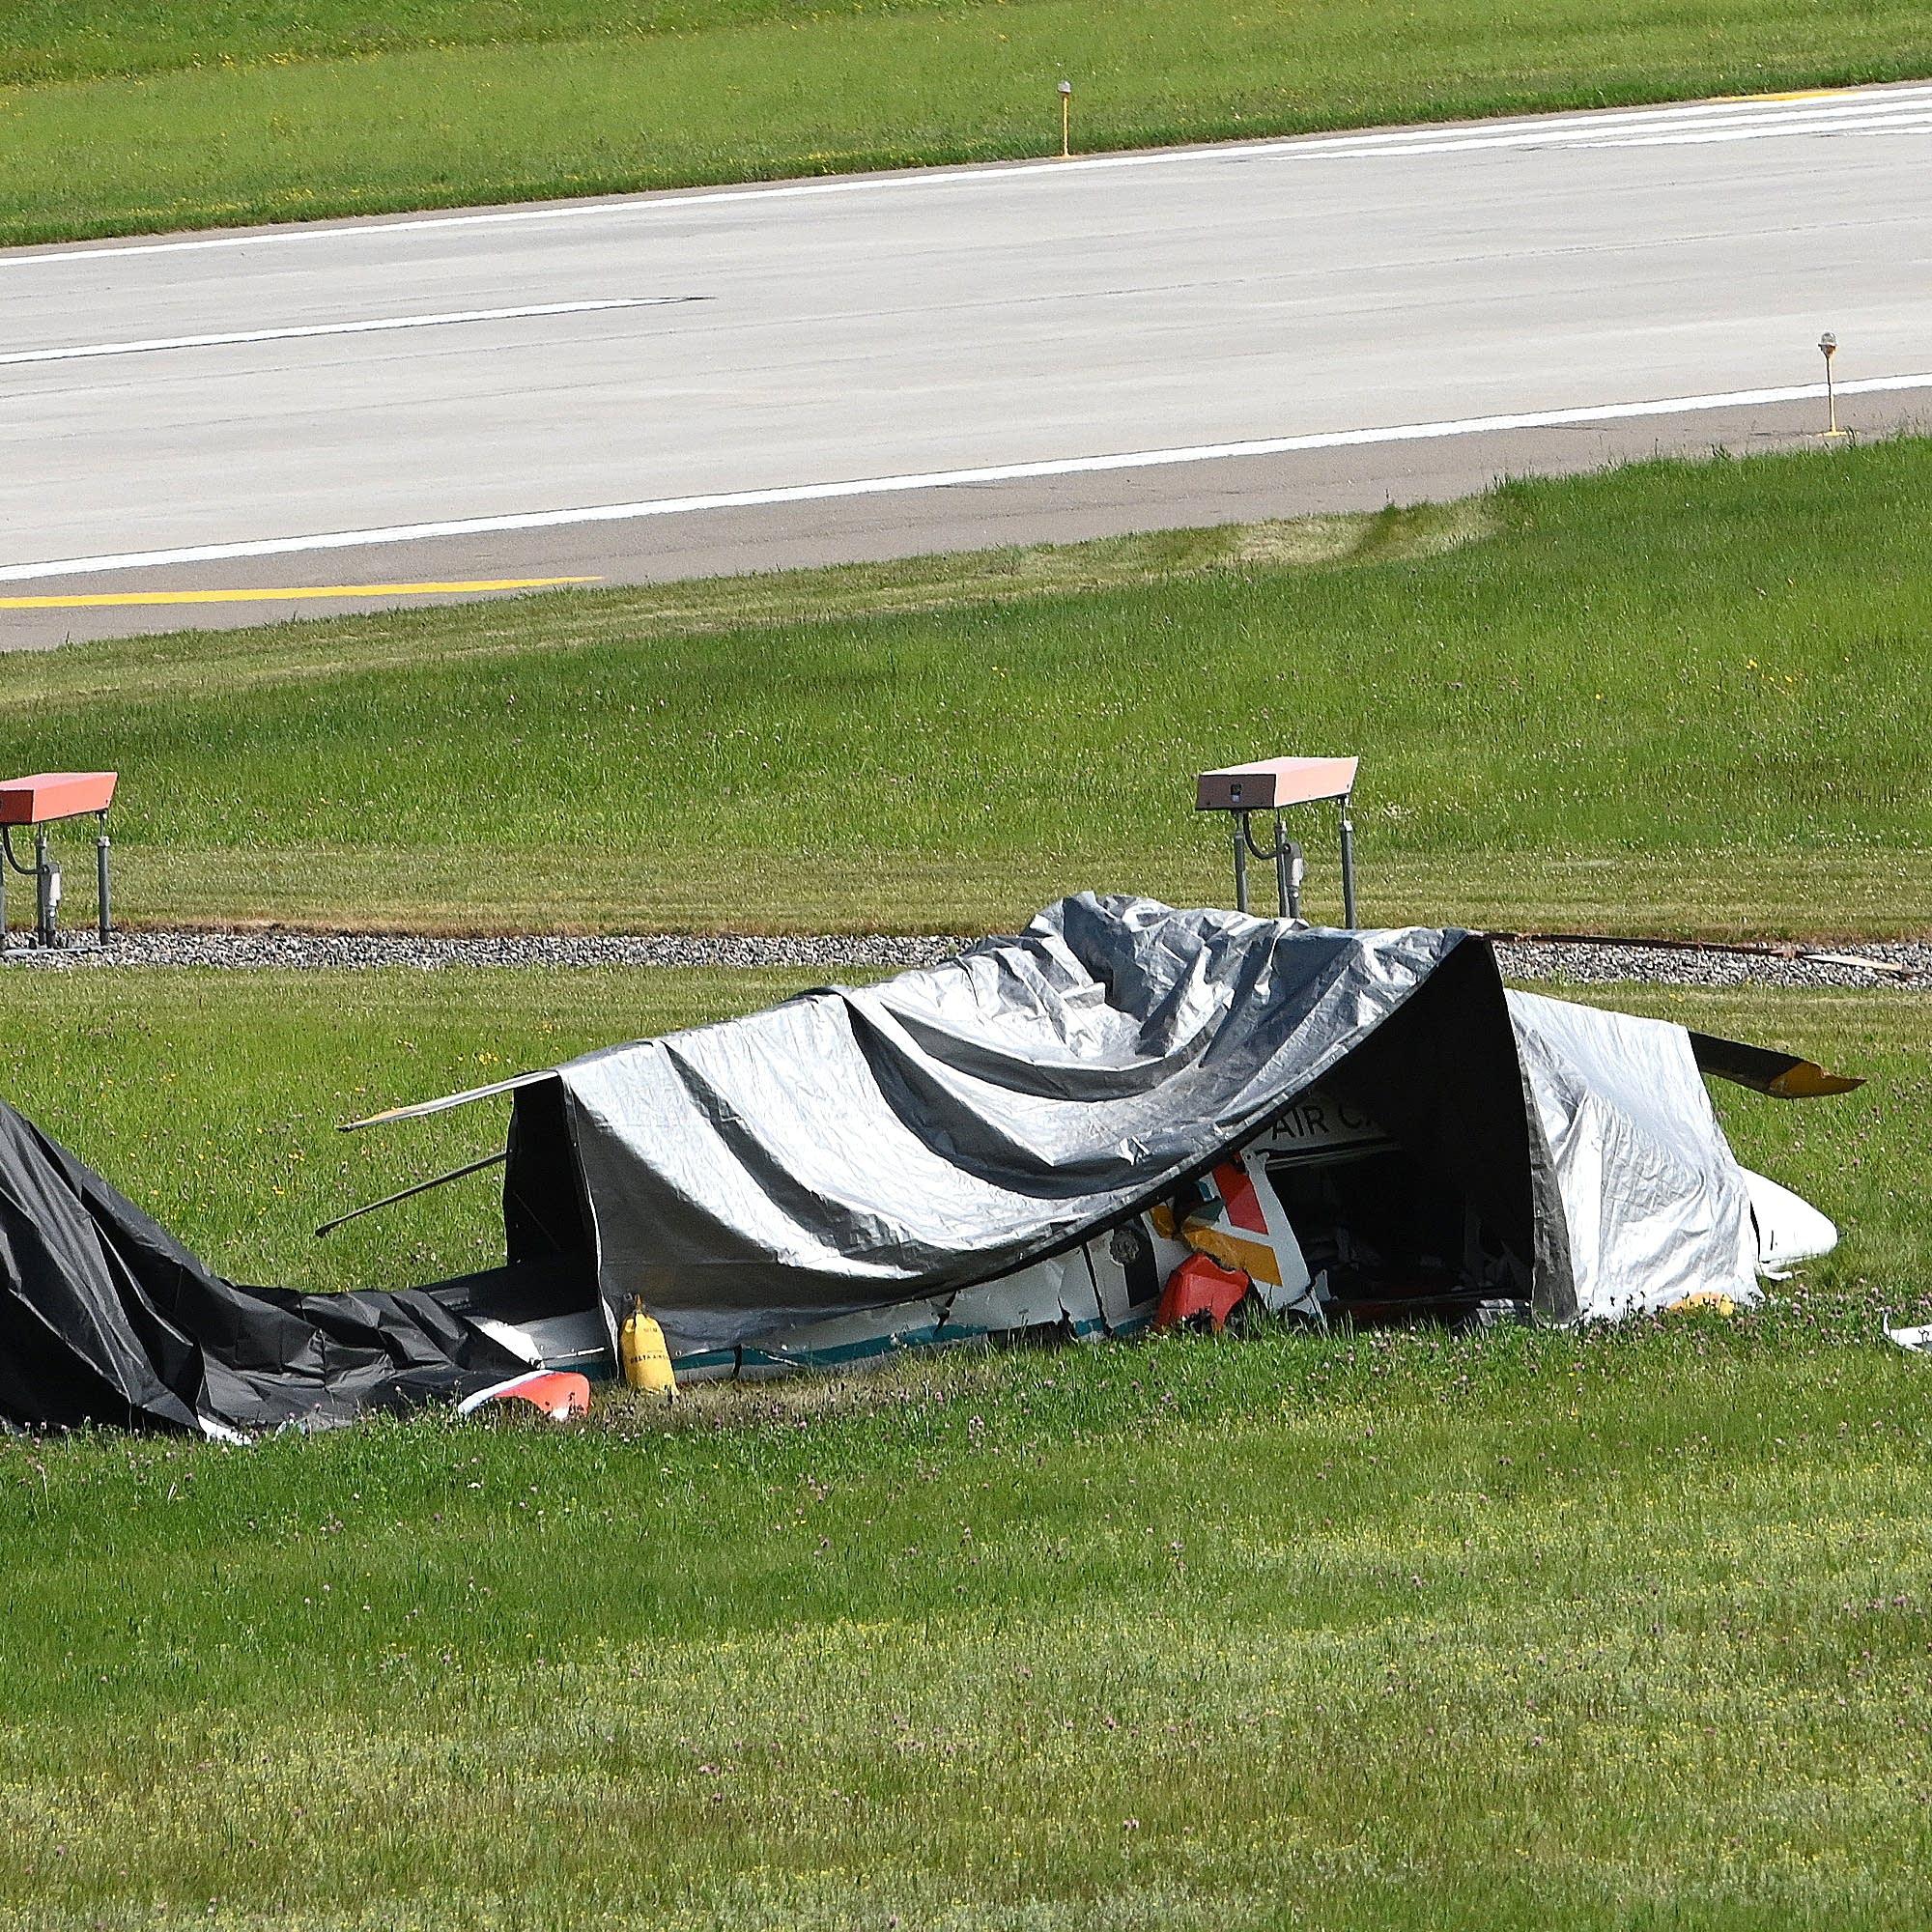 Nurse, pilot killed in medical helicopter crash in Brainerd | MPR News